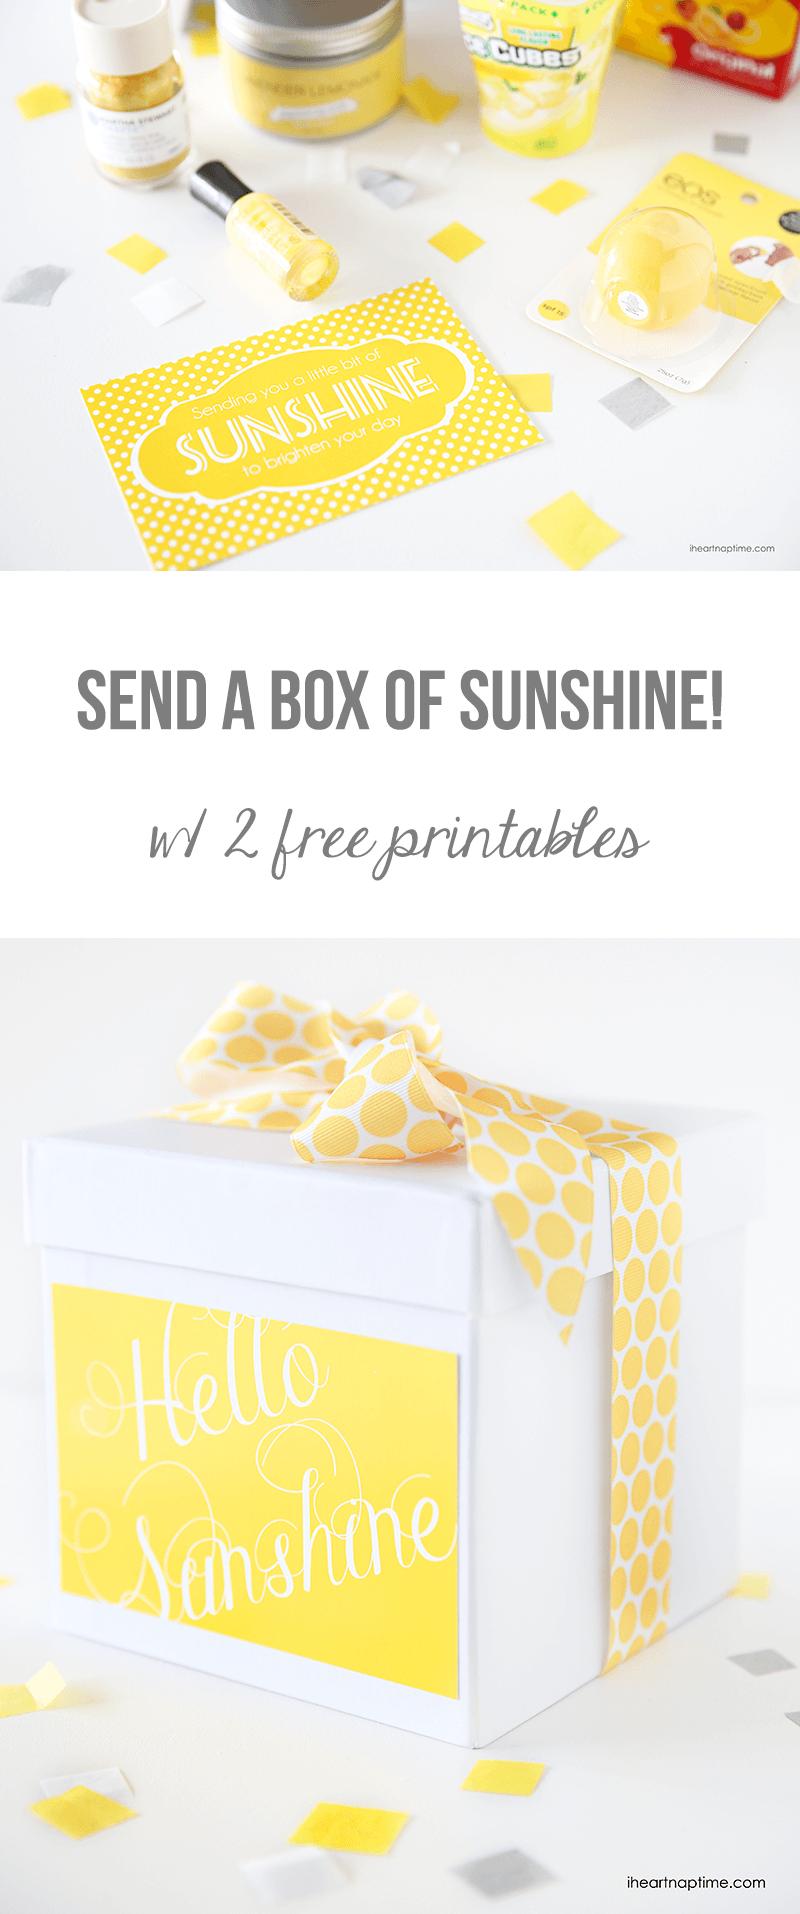 Send A Box Of Sunshine {Free Printables} - Box Of Sunshine Free Printable